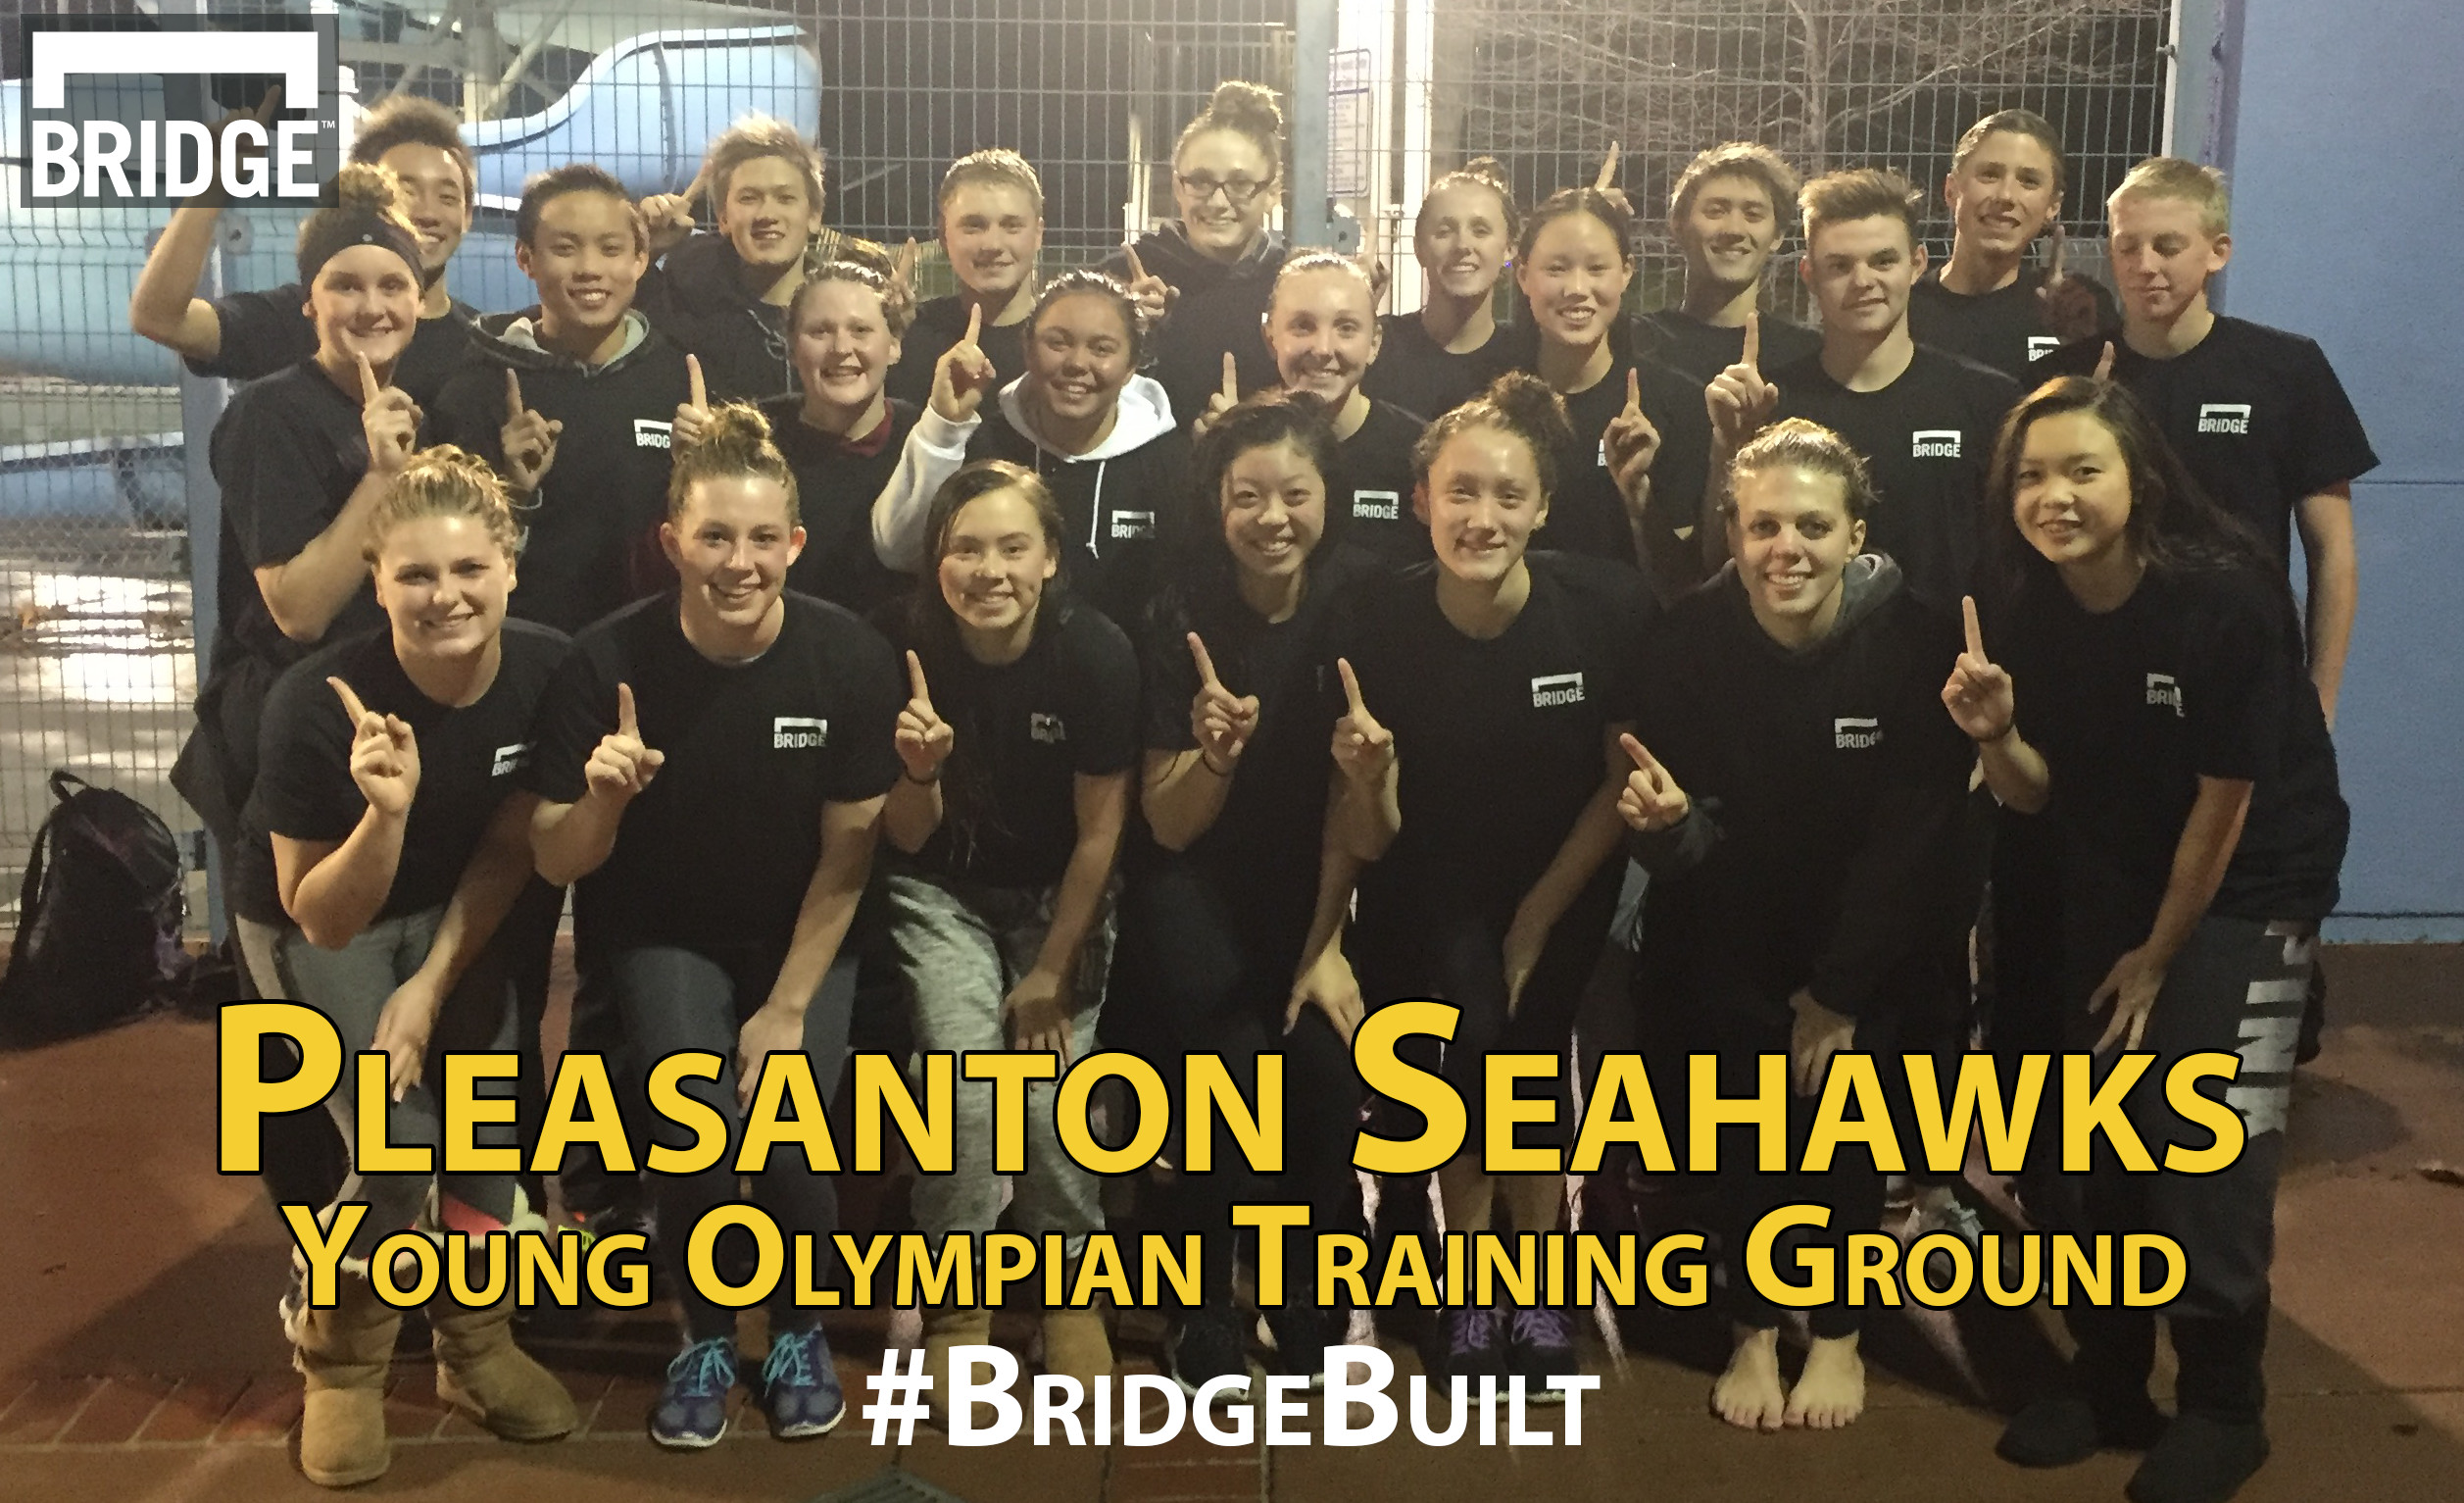 The BridgeBuilt Pleasanton Seahawks